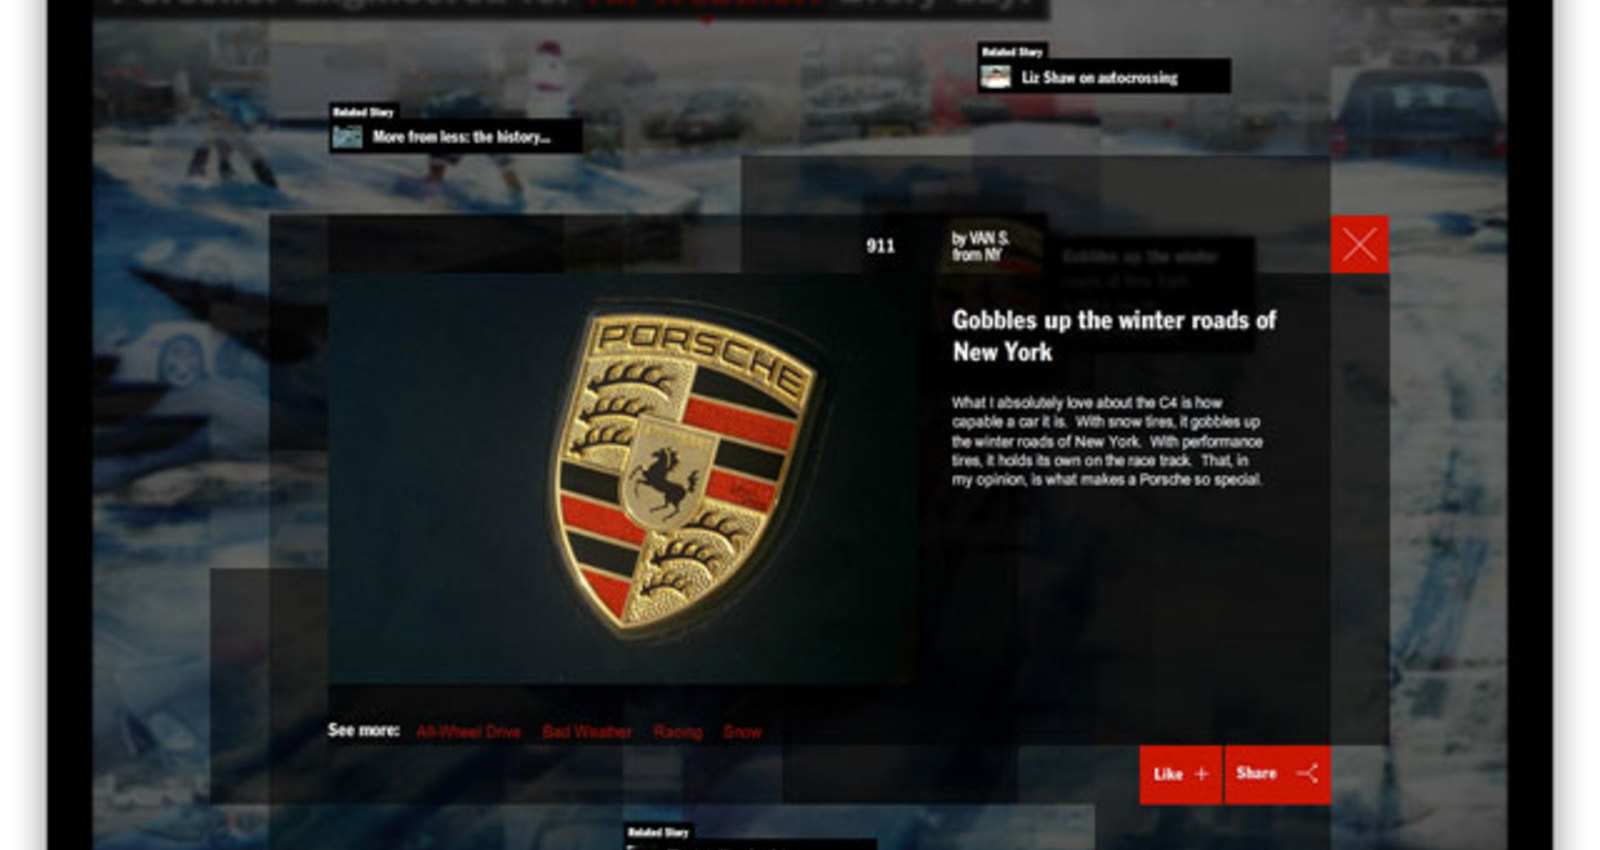 Porsche: Engineered for Magic, Everyday